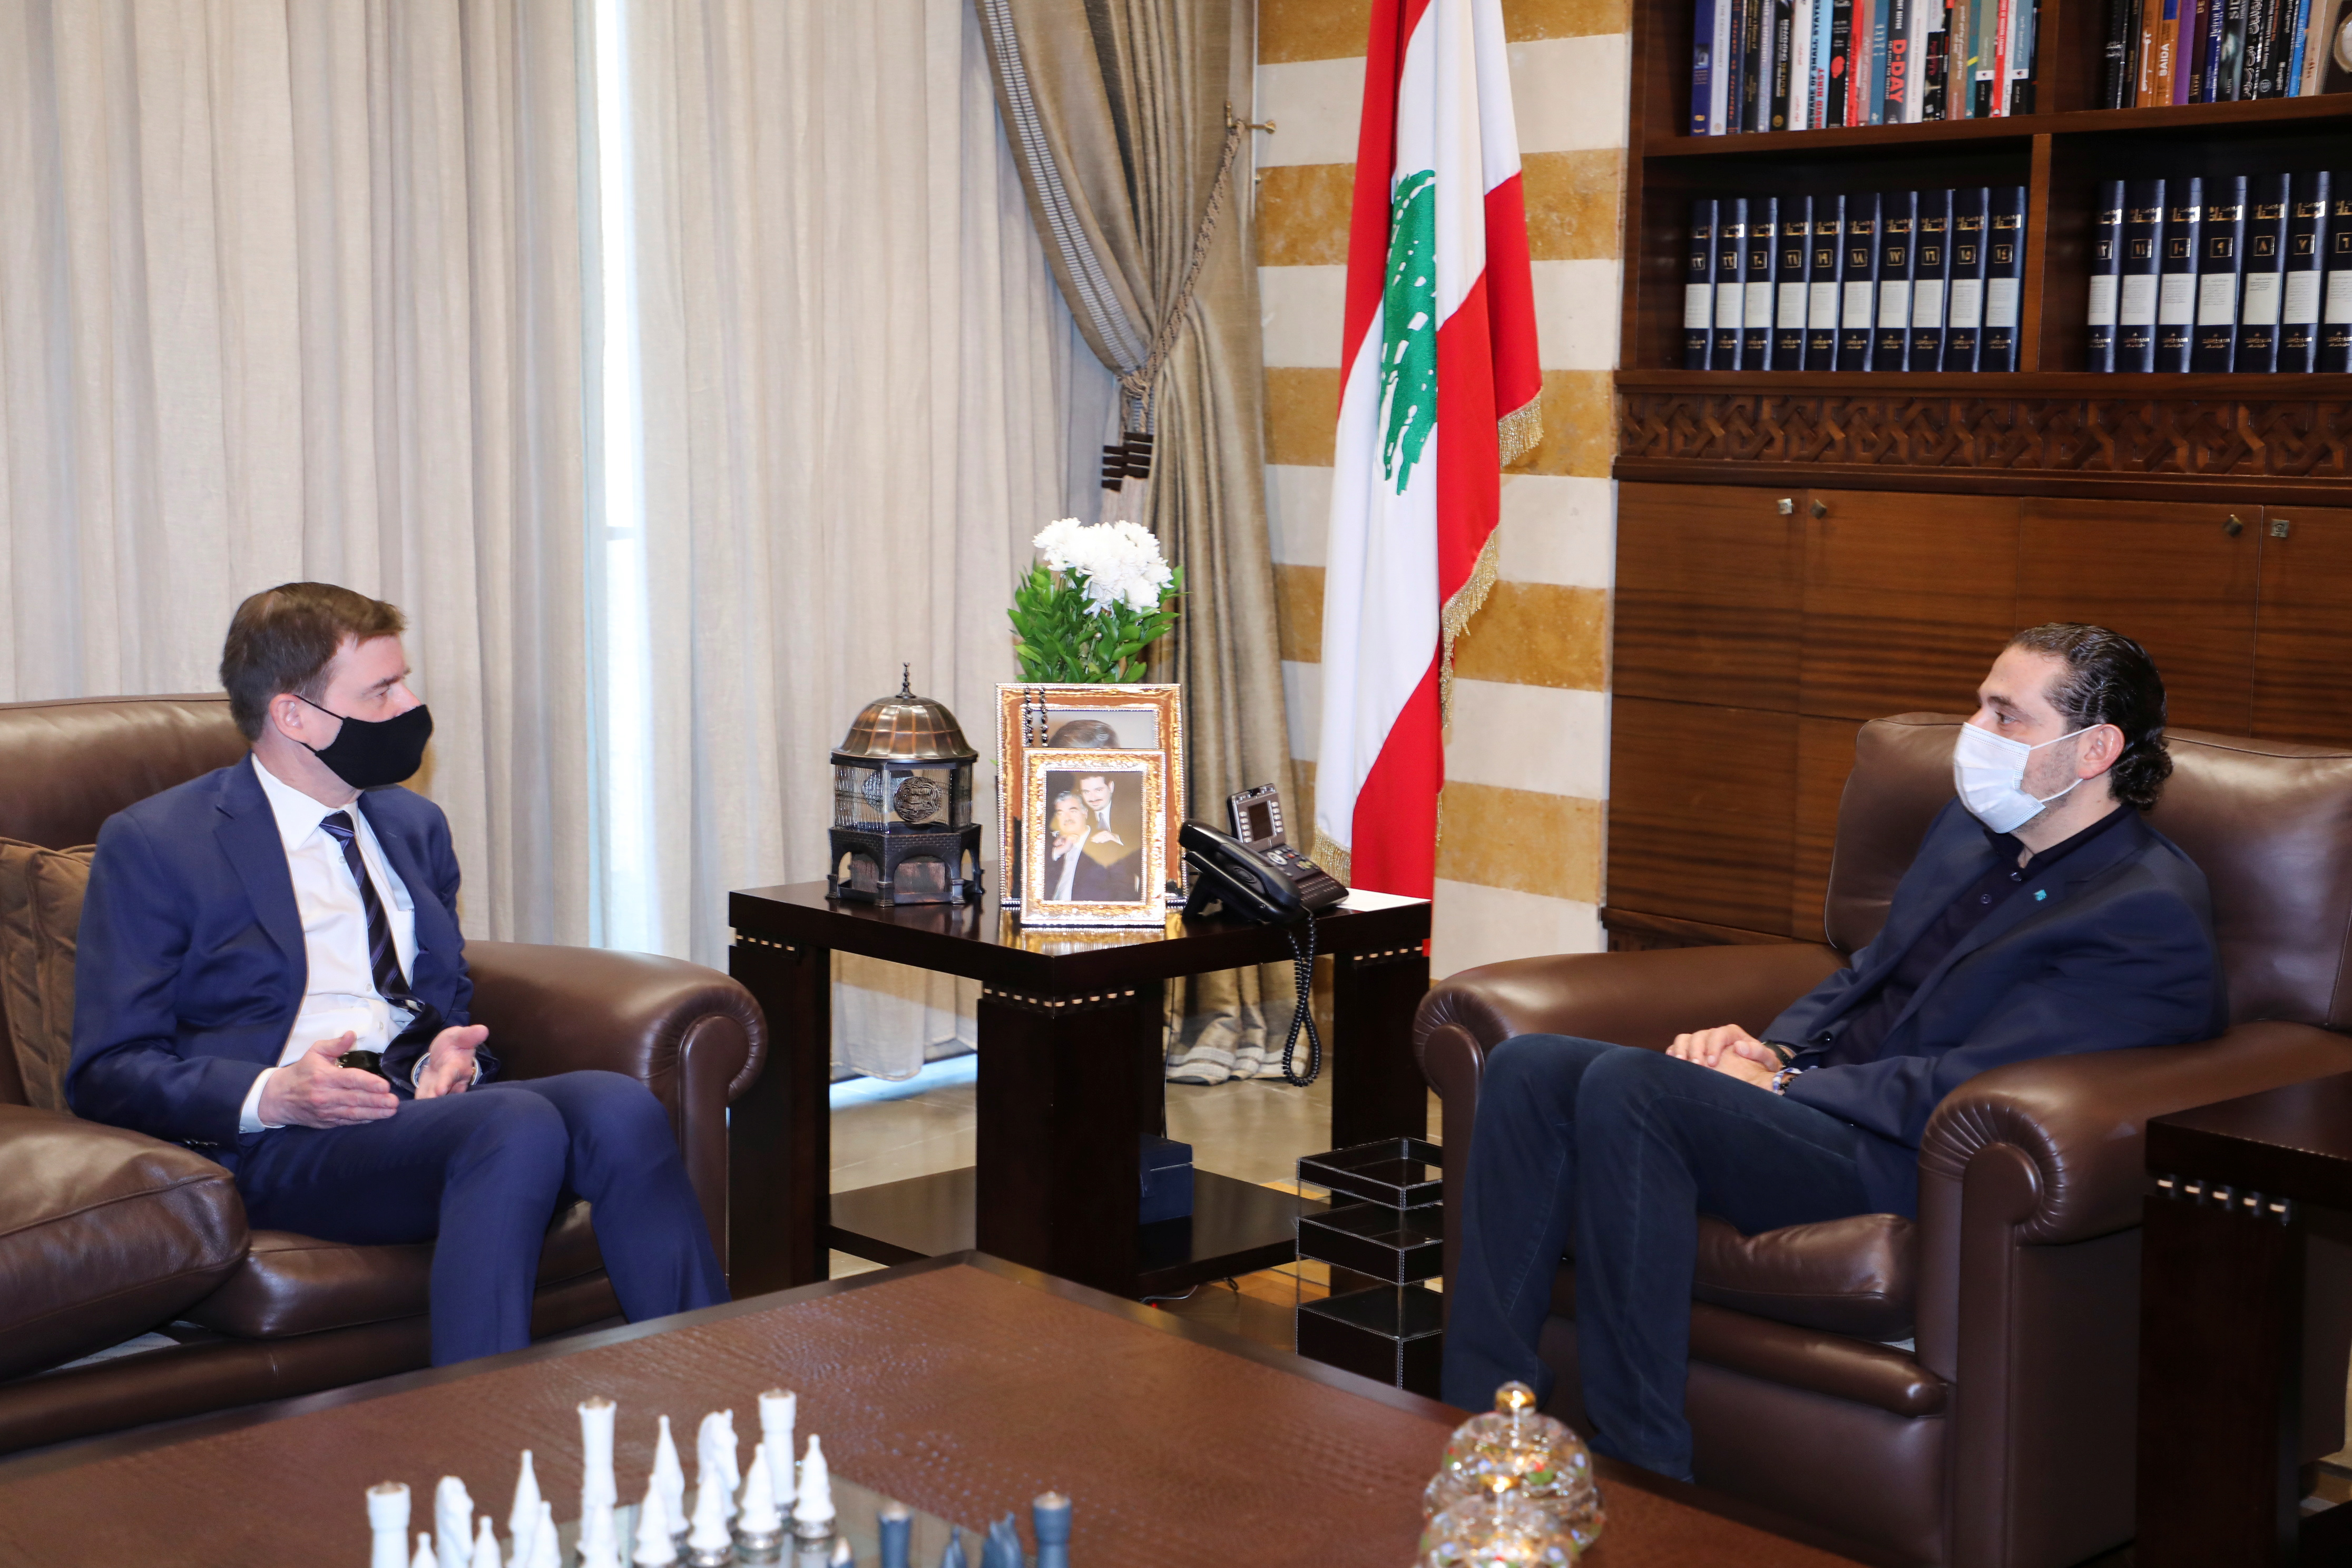 U.S. Under Secretary of State for Political Affairs David Hale attends a meeting with Lebanon's Prime Minister-designate Saad al-Hariri in Beirut, Lebanon April 14, 2021. REUTERS/Mohamed Azakir